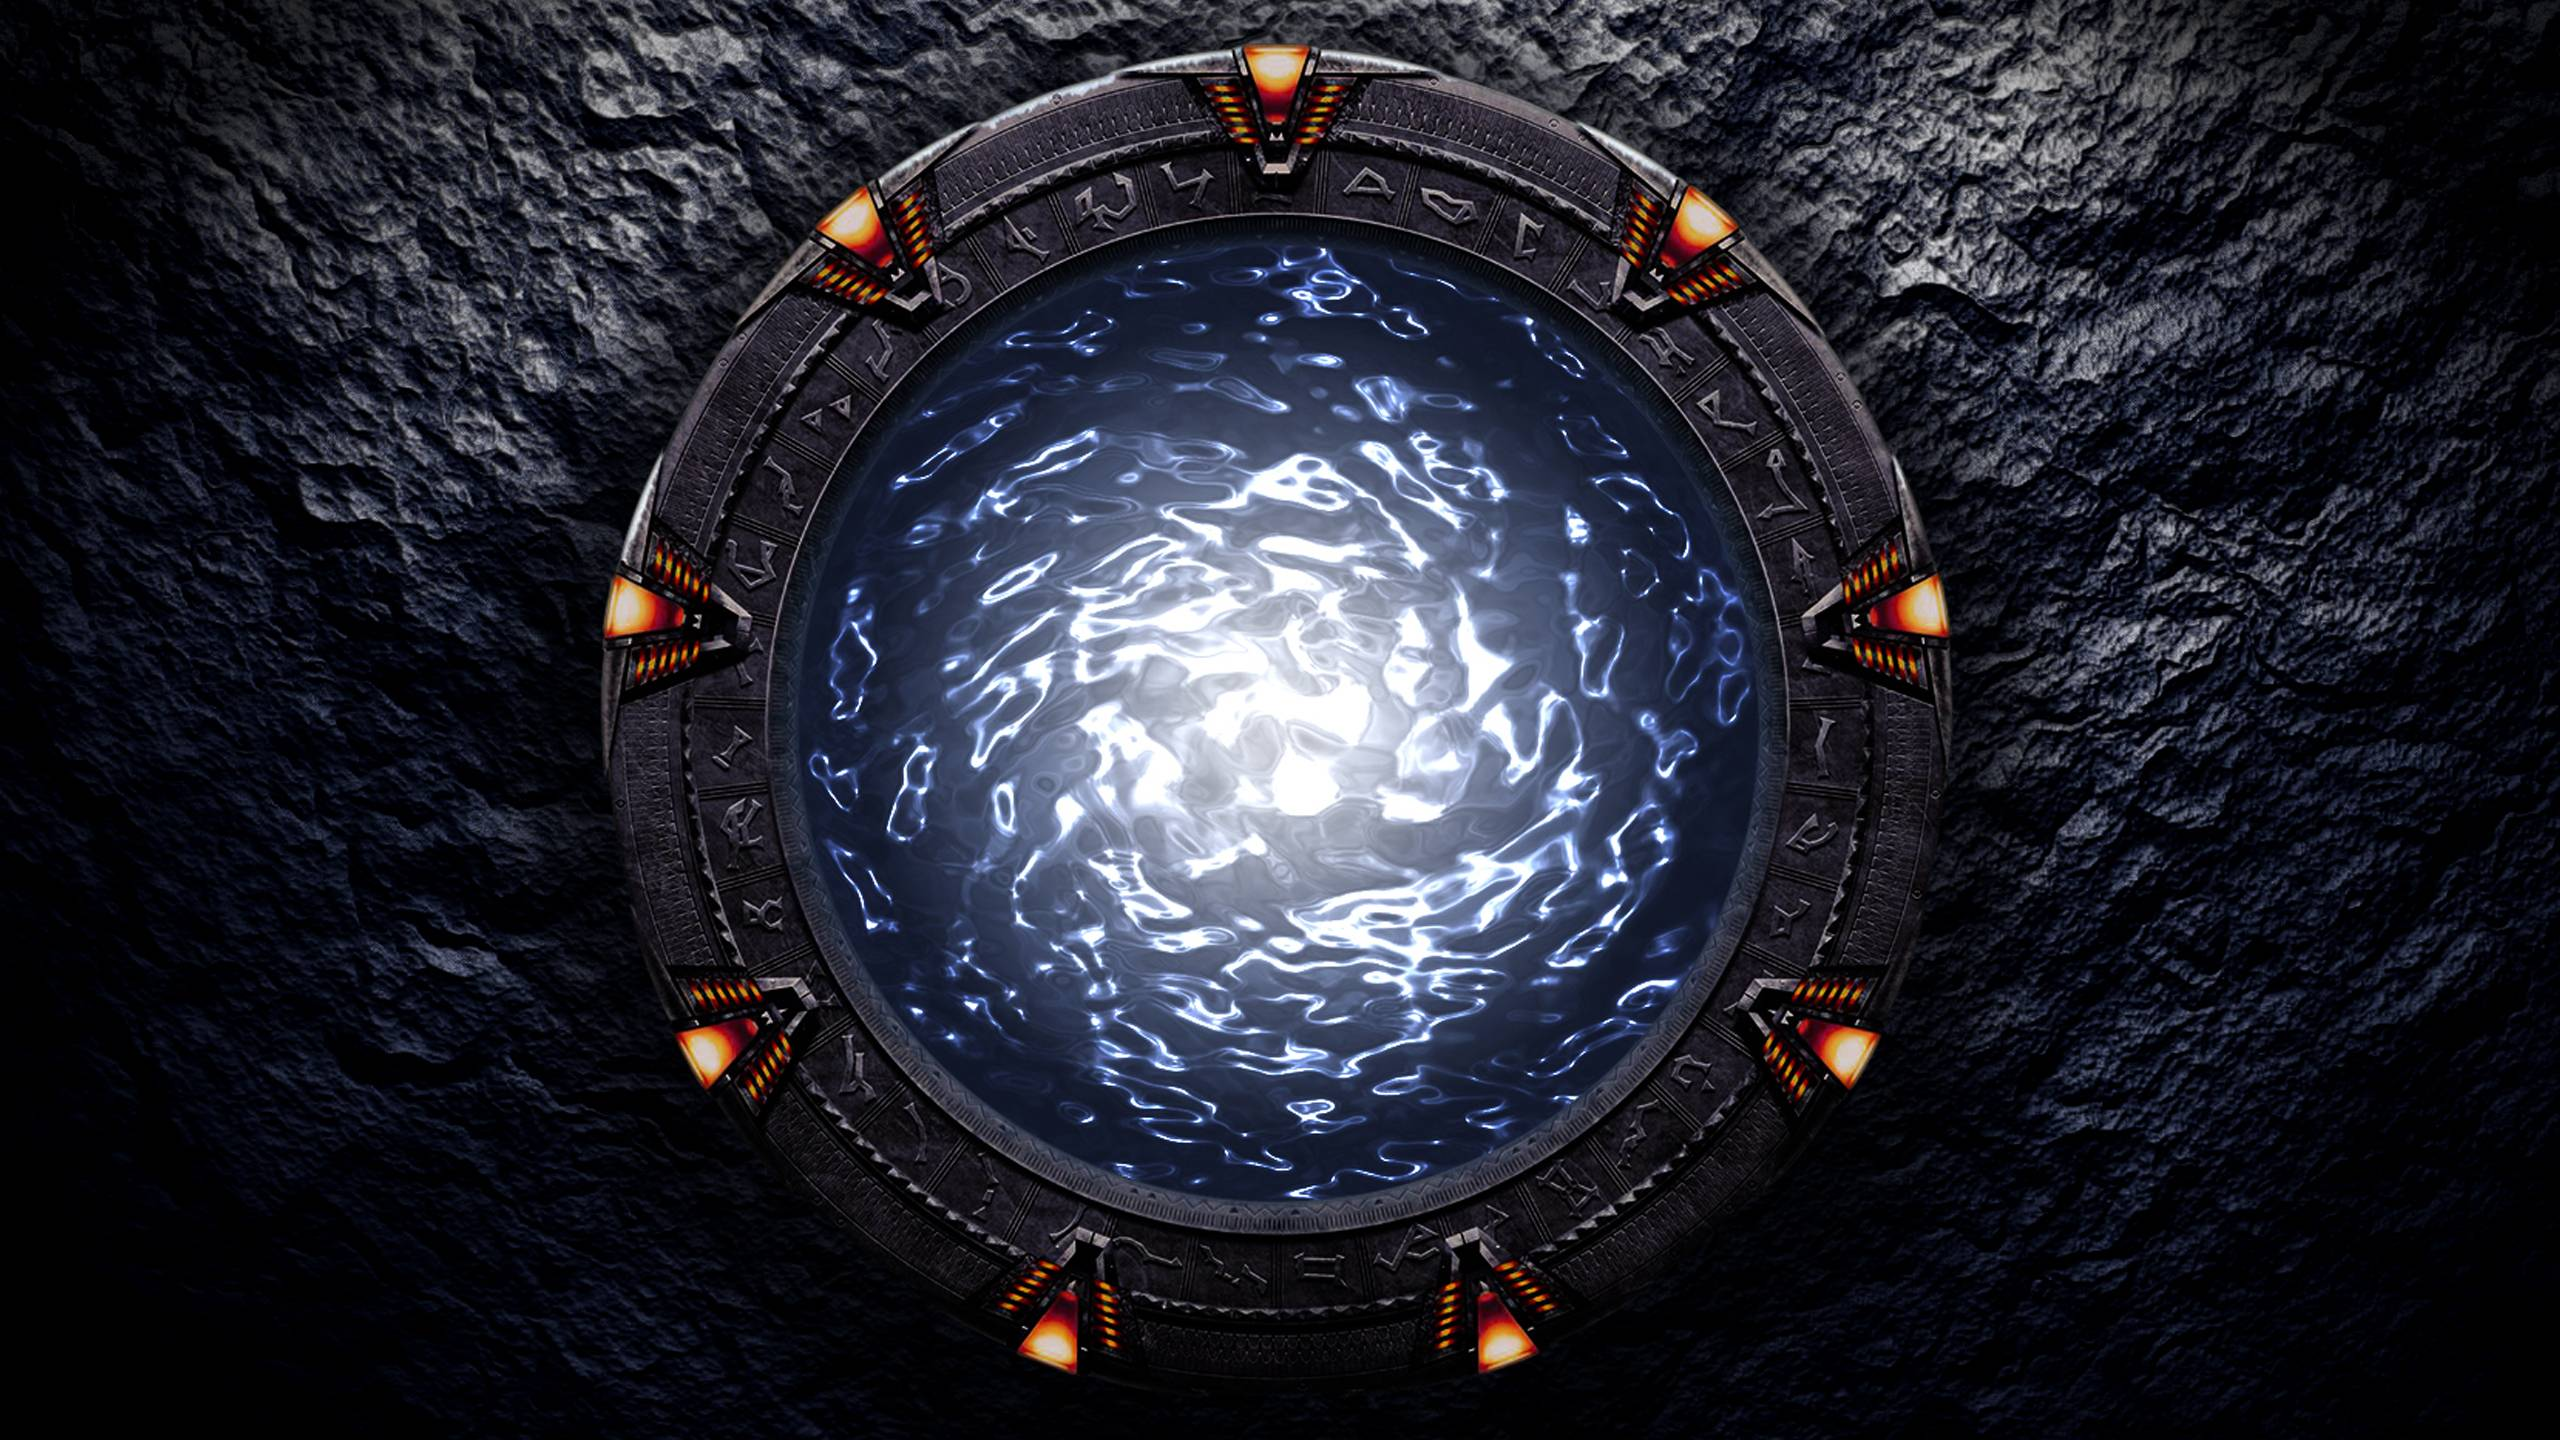 Stargate SG-1 Wallpaper HD Download